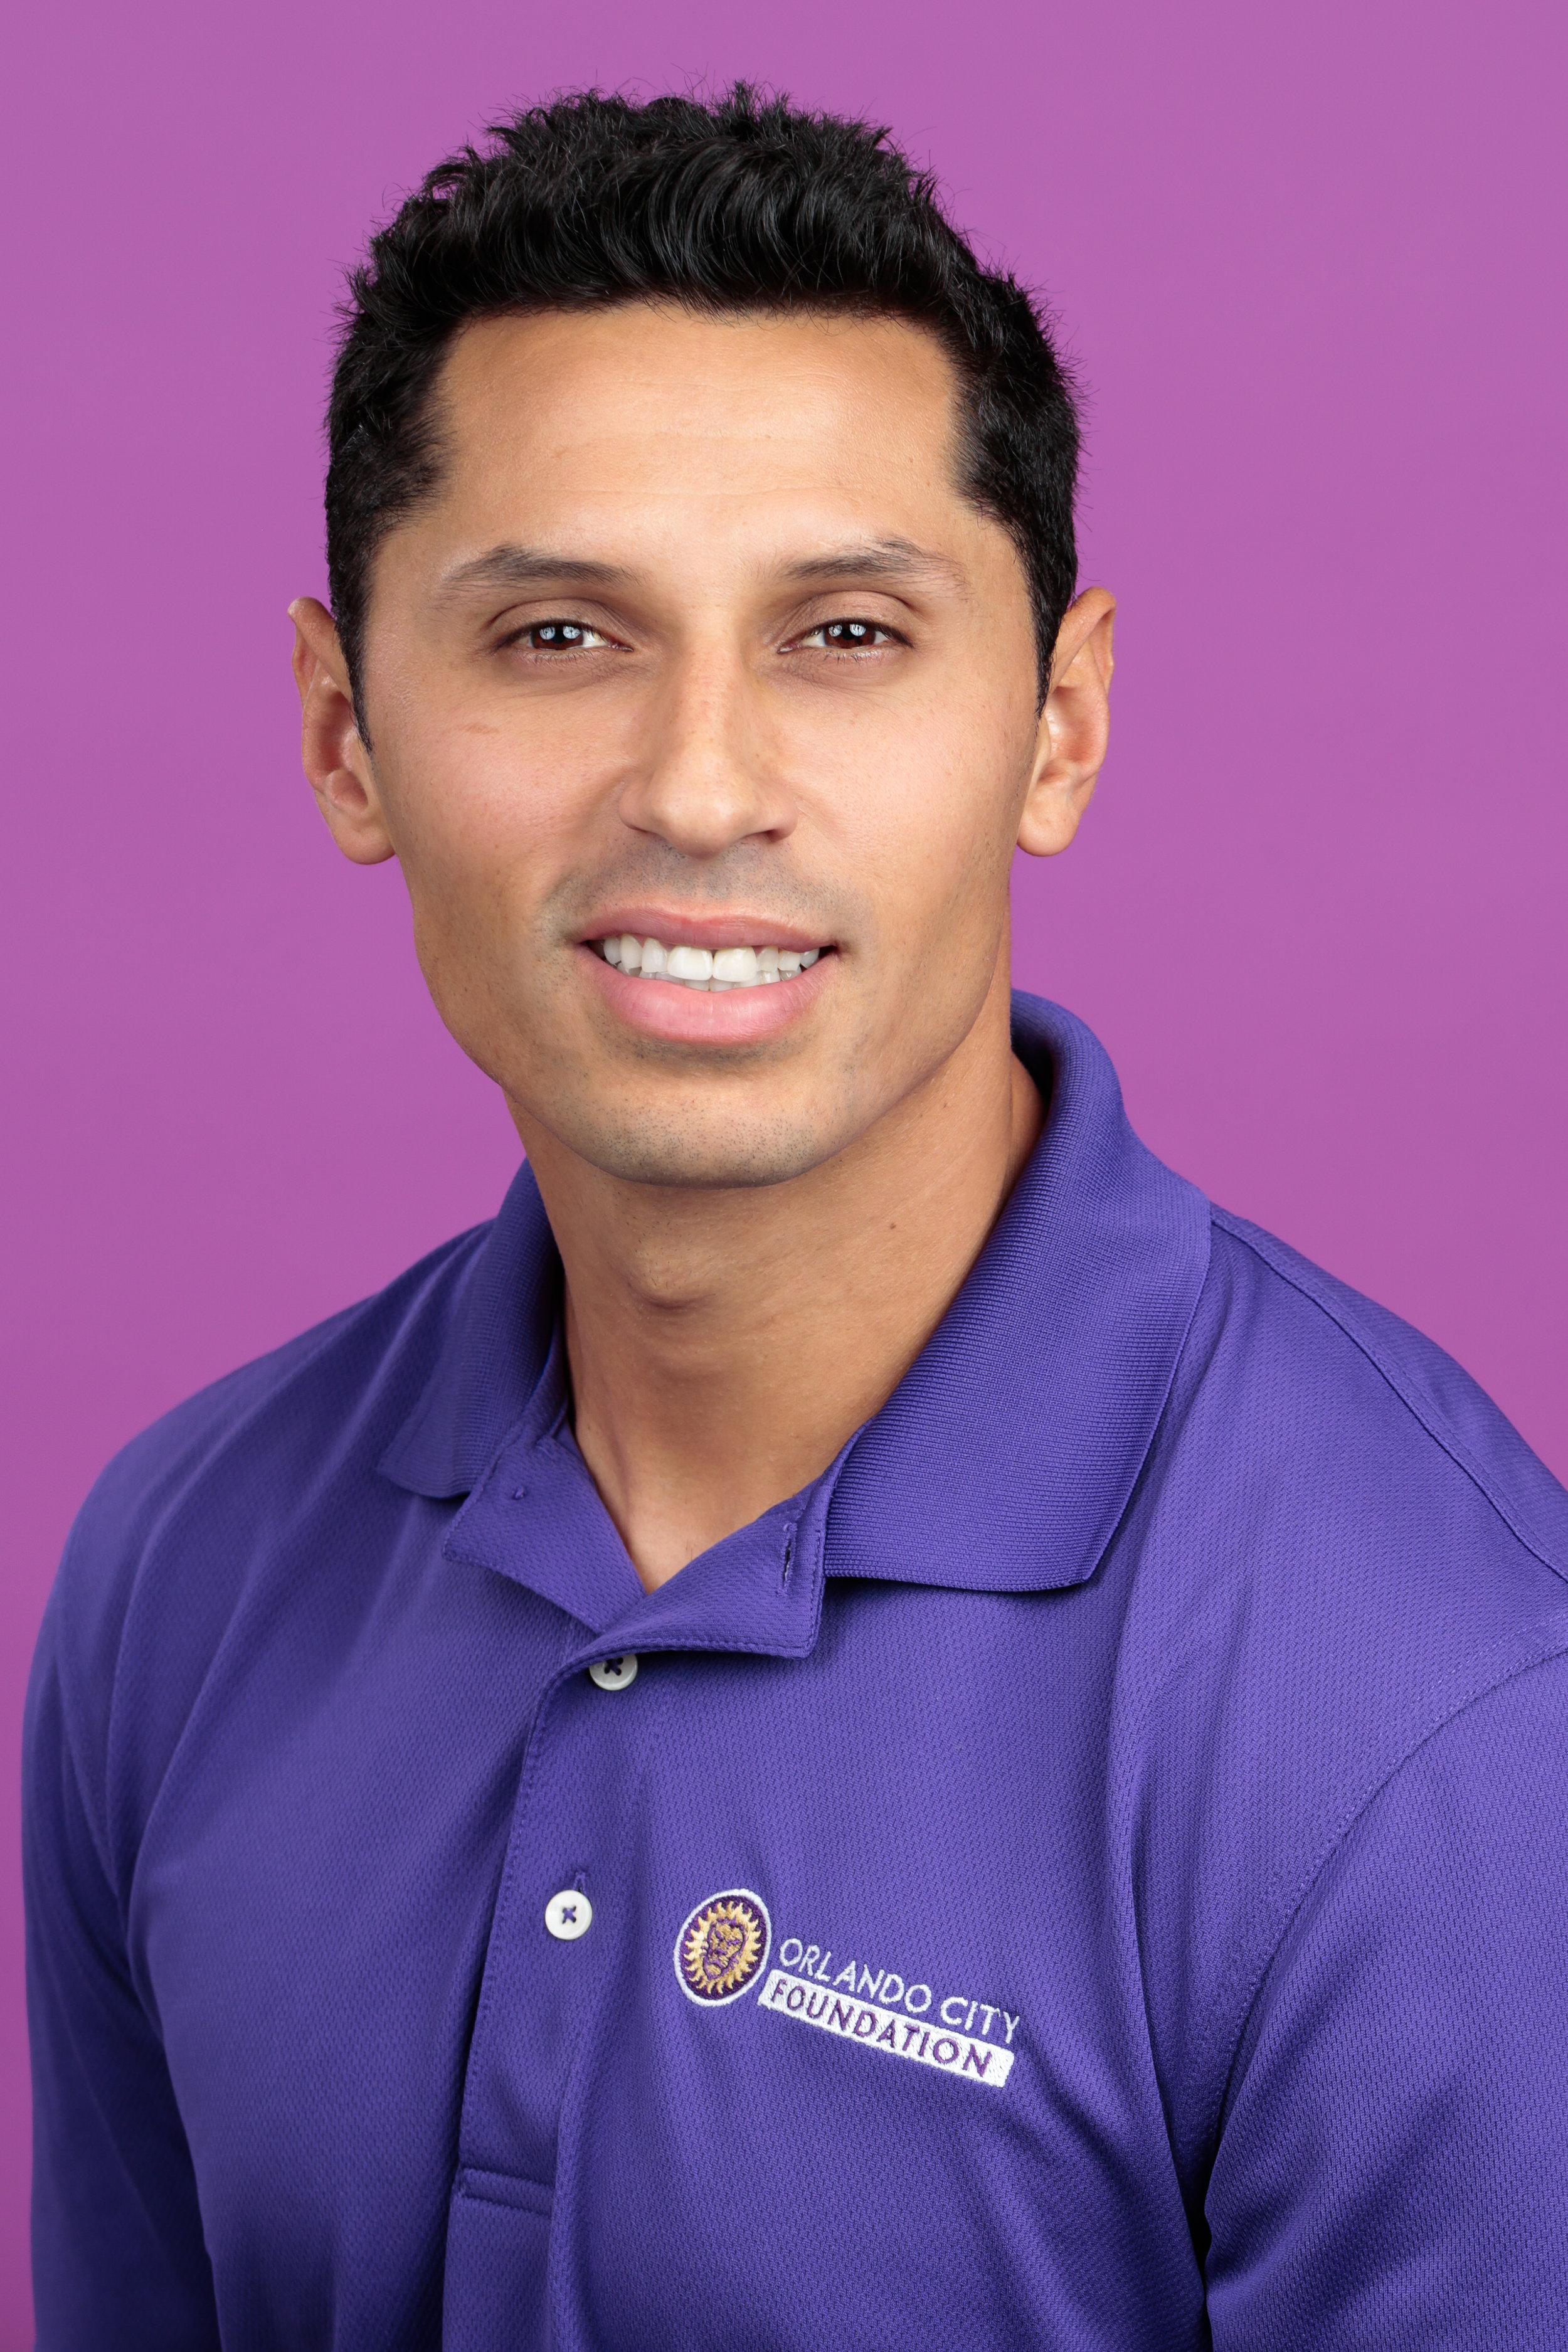 Miguel Gallardo - Kicking It Back Programs Manager & Community Ambassador